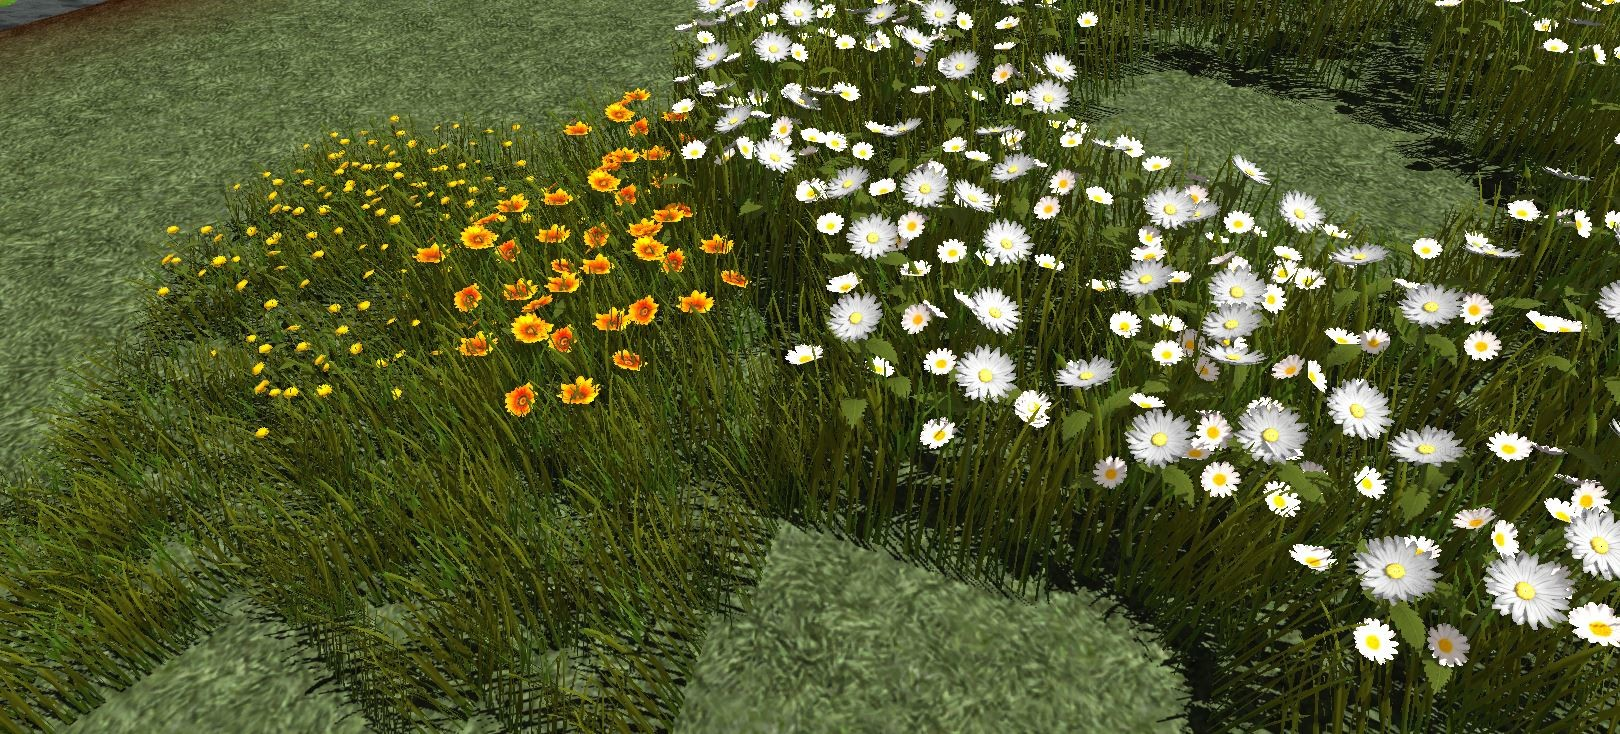 Elise ejtheartist motzny flowersandgrass